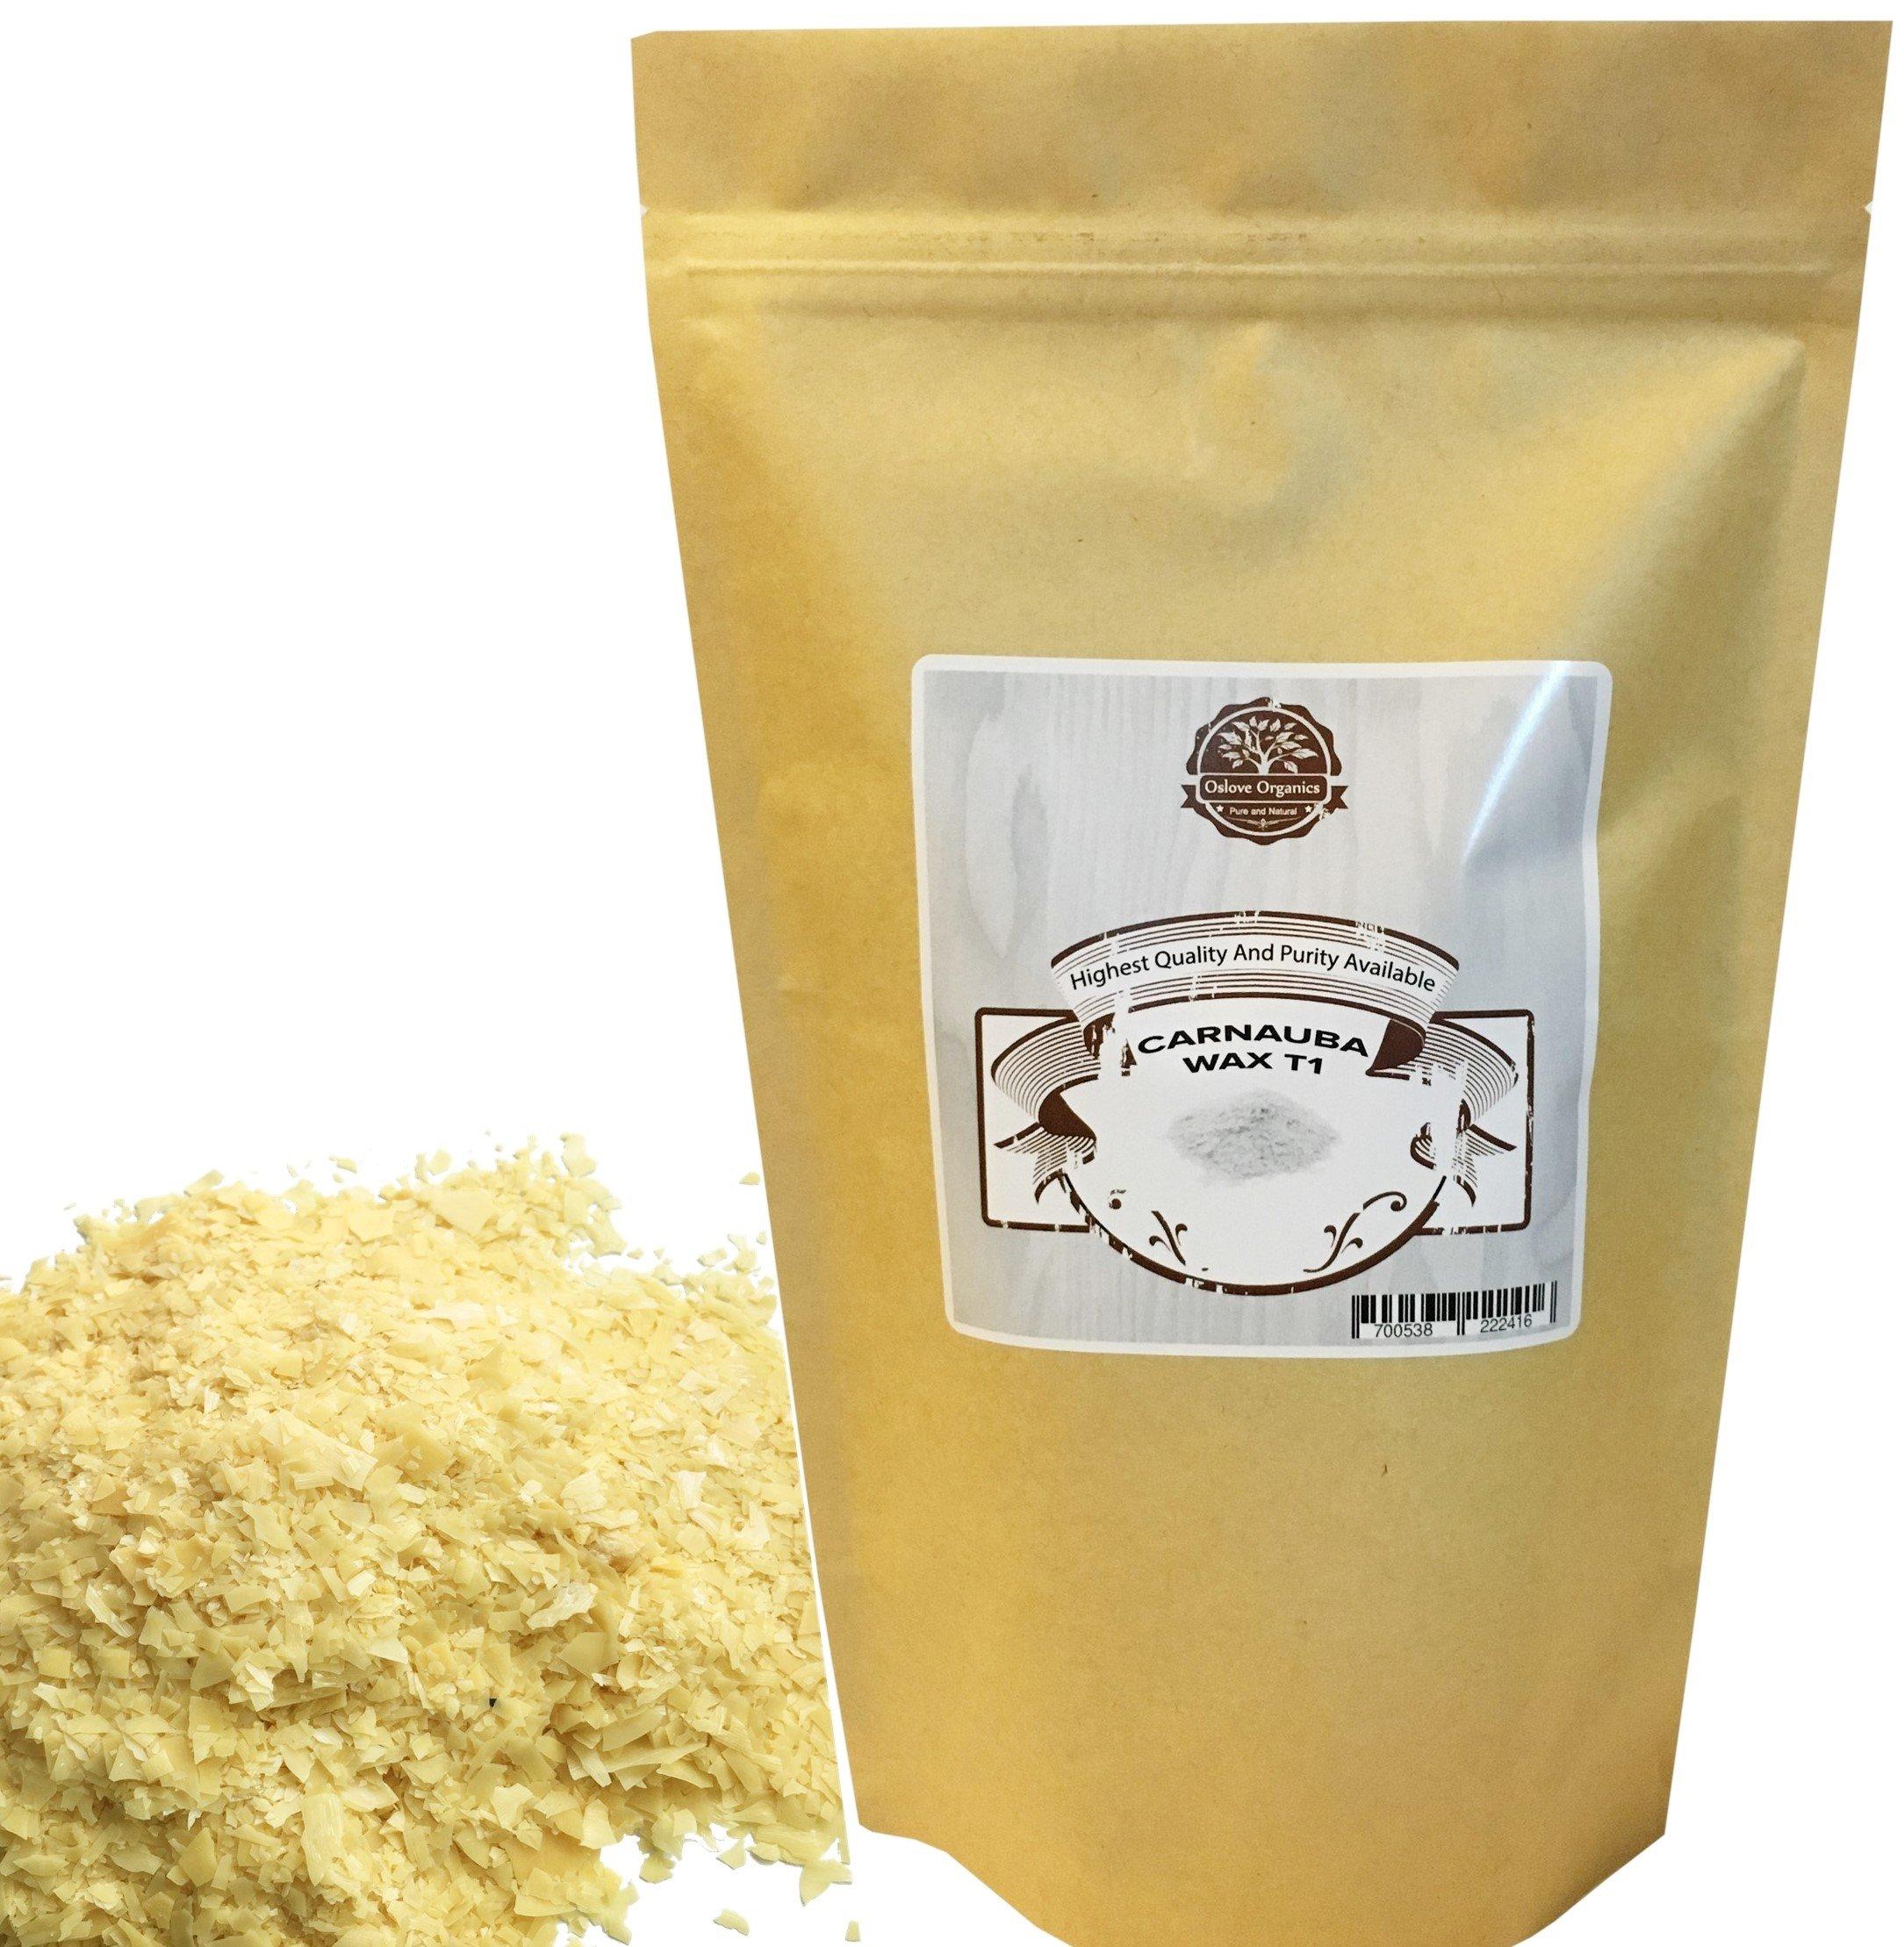 Organic Carnauba Wax Flakes 1 LB by Oslove Organics- T1 Grade, multipurpose wax. by Oslove Organics